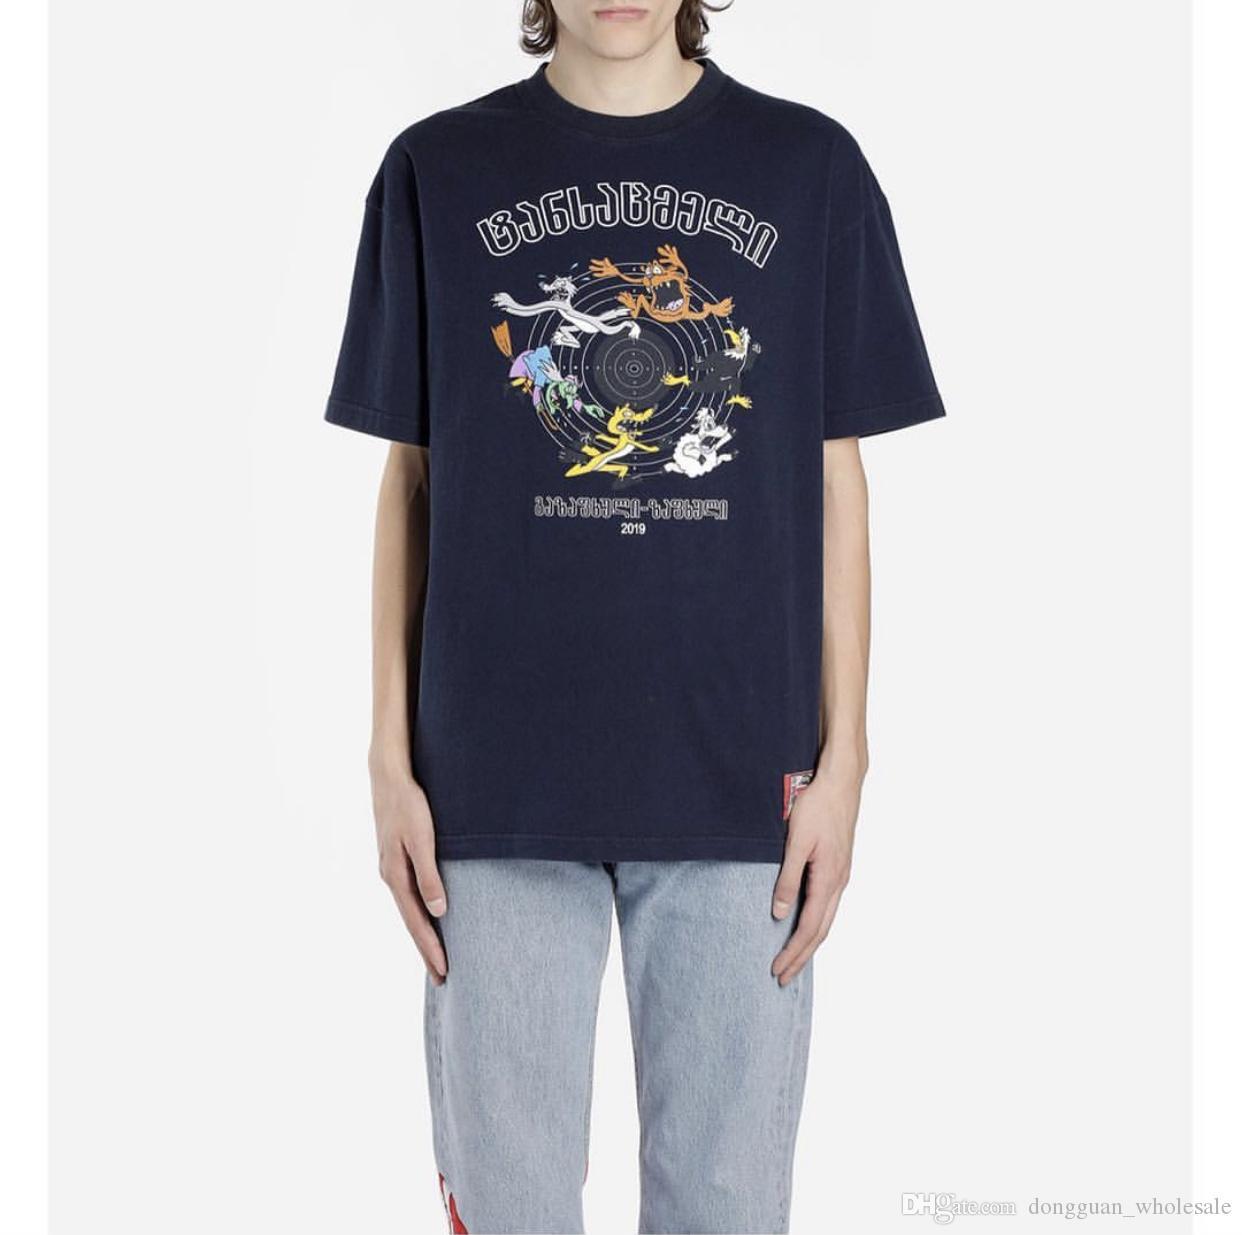 757cb0df0d4 Vetements T Shirt Men Women 19ss Streetwear Oversize Harajuku TShirt  Xxxtentacion Front Back Wear Vetements Men Tshirt Awesome T Shirt Clever T  Shirts From ...